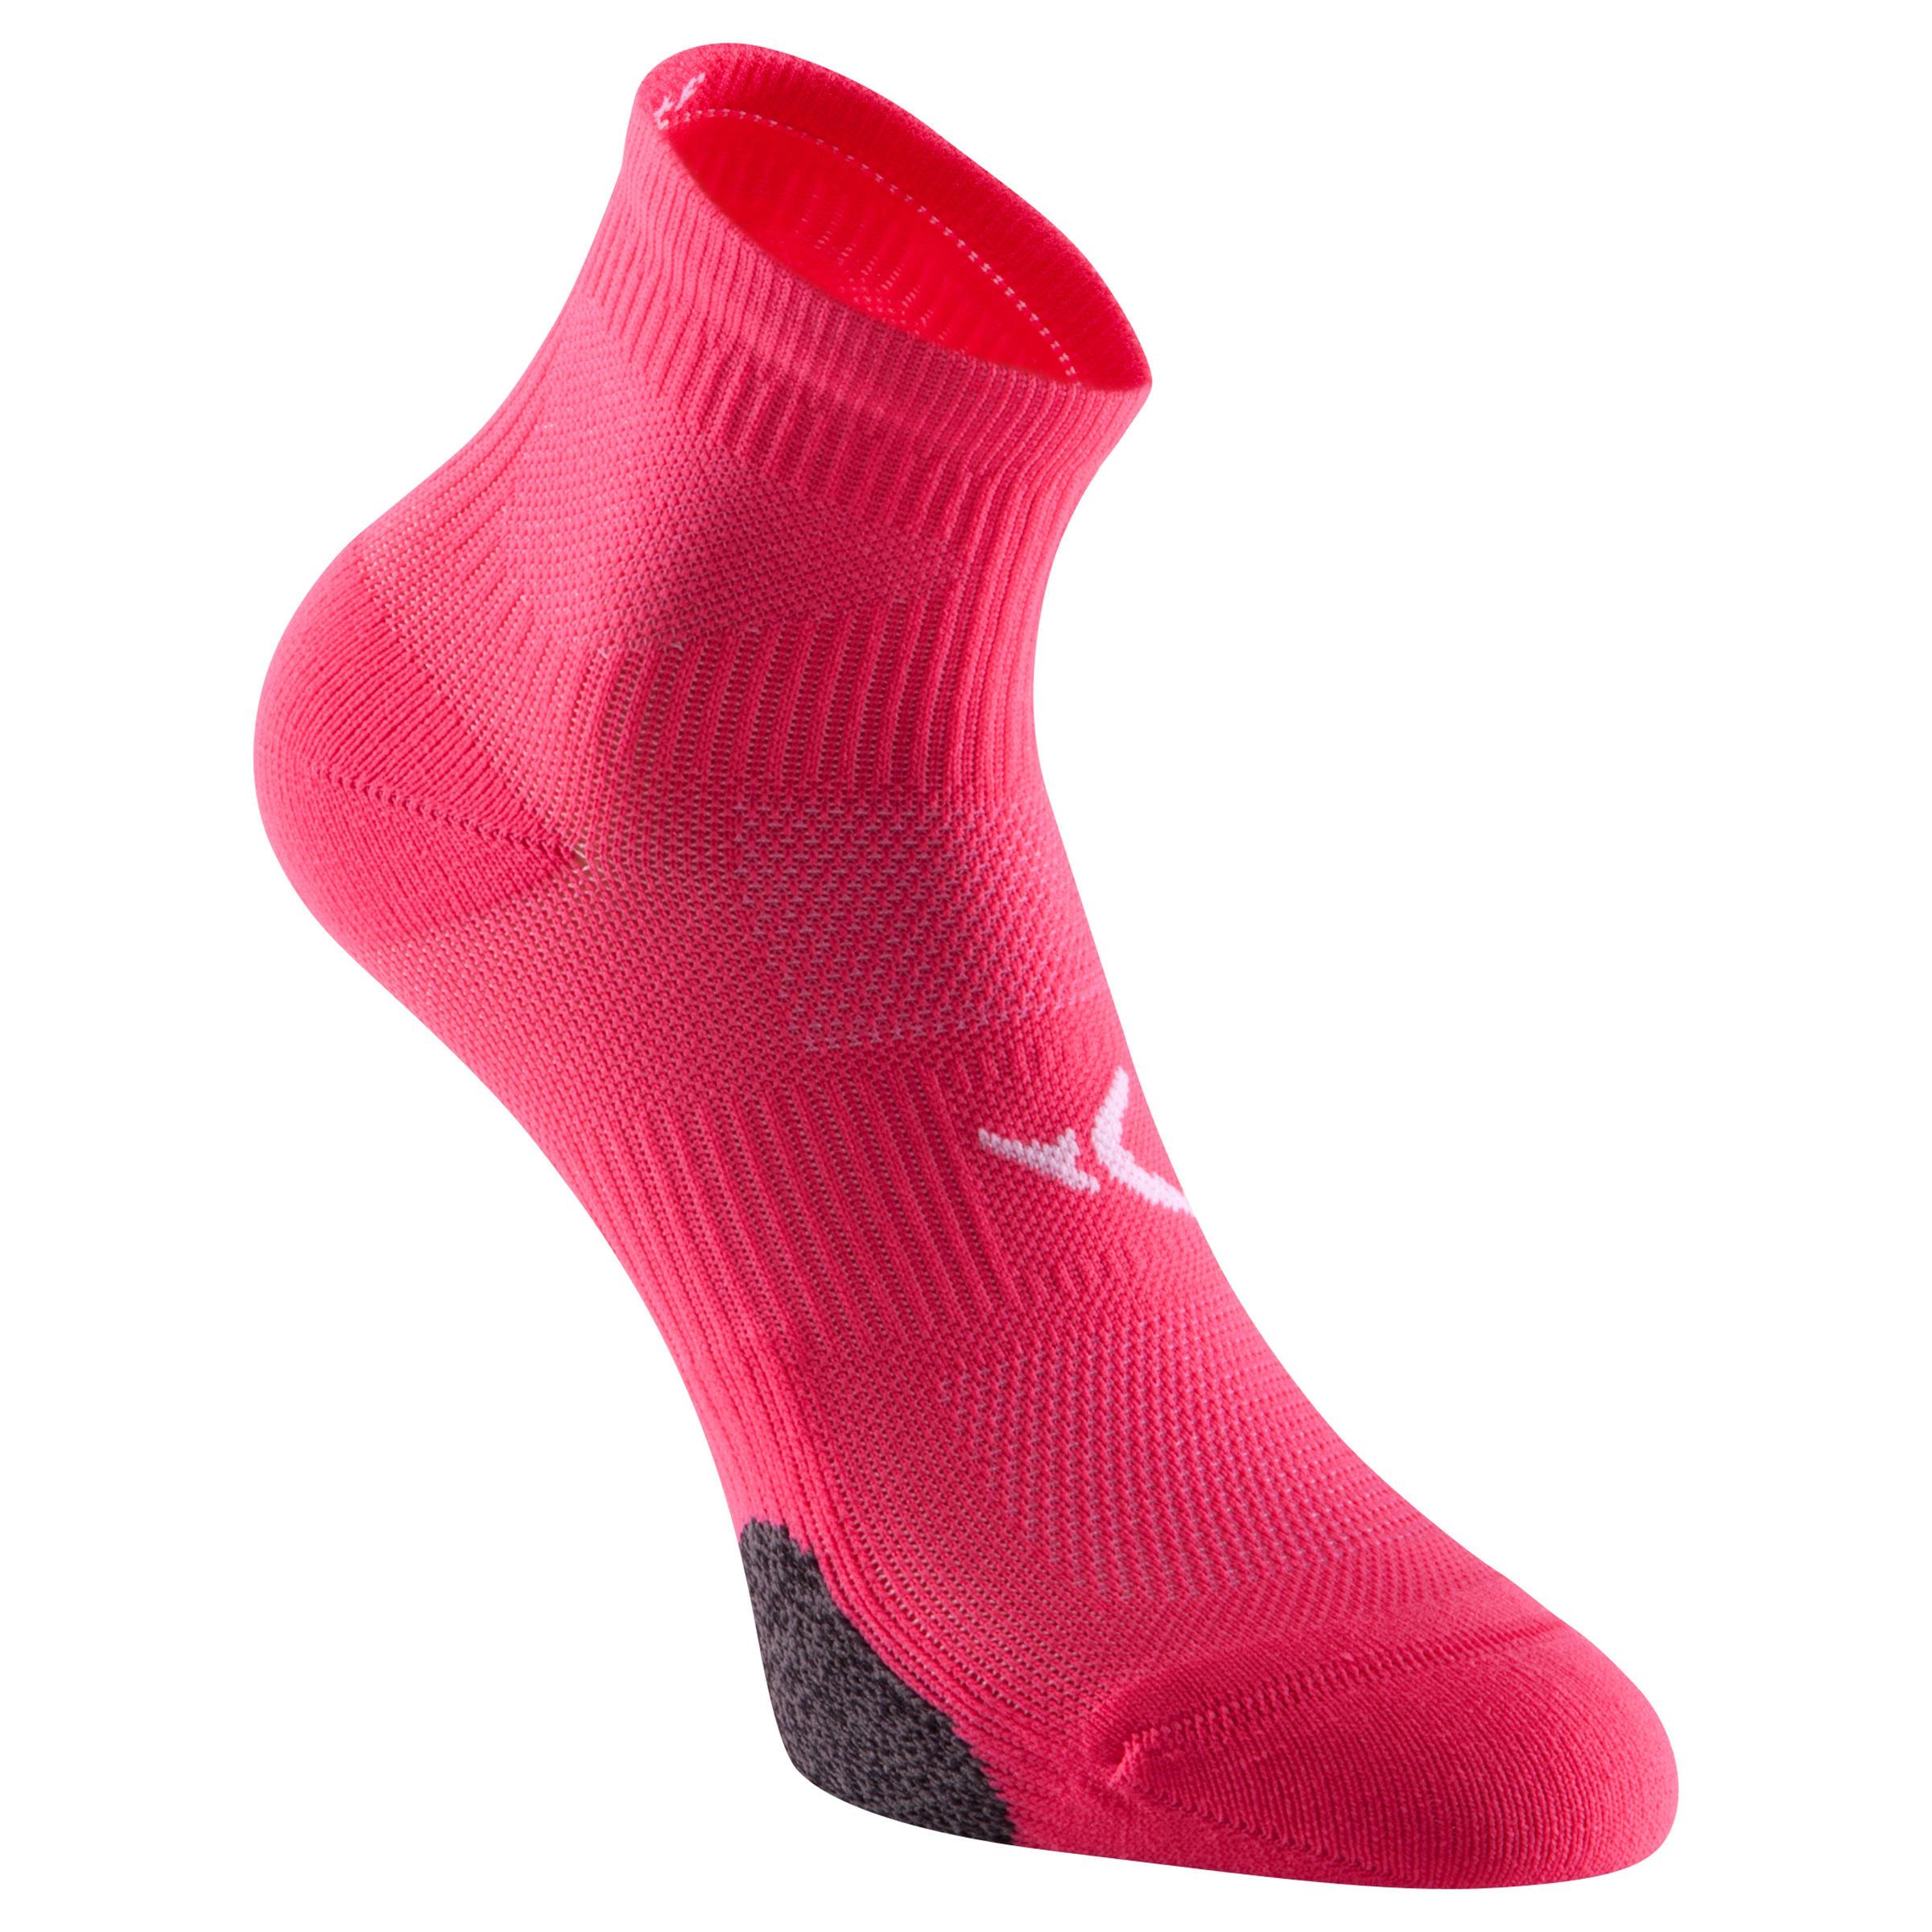 Calcetines cortos fitness x2 rosa